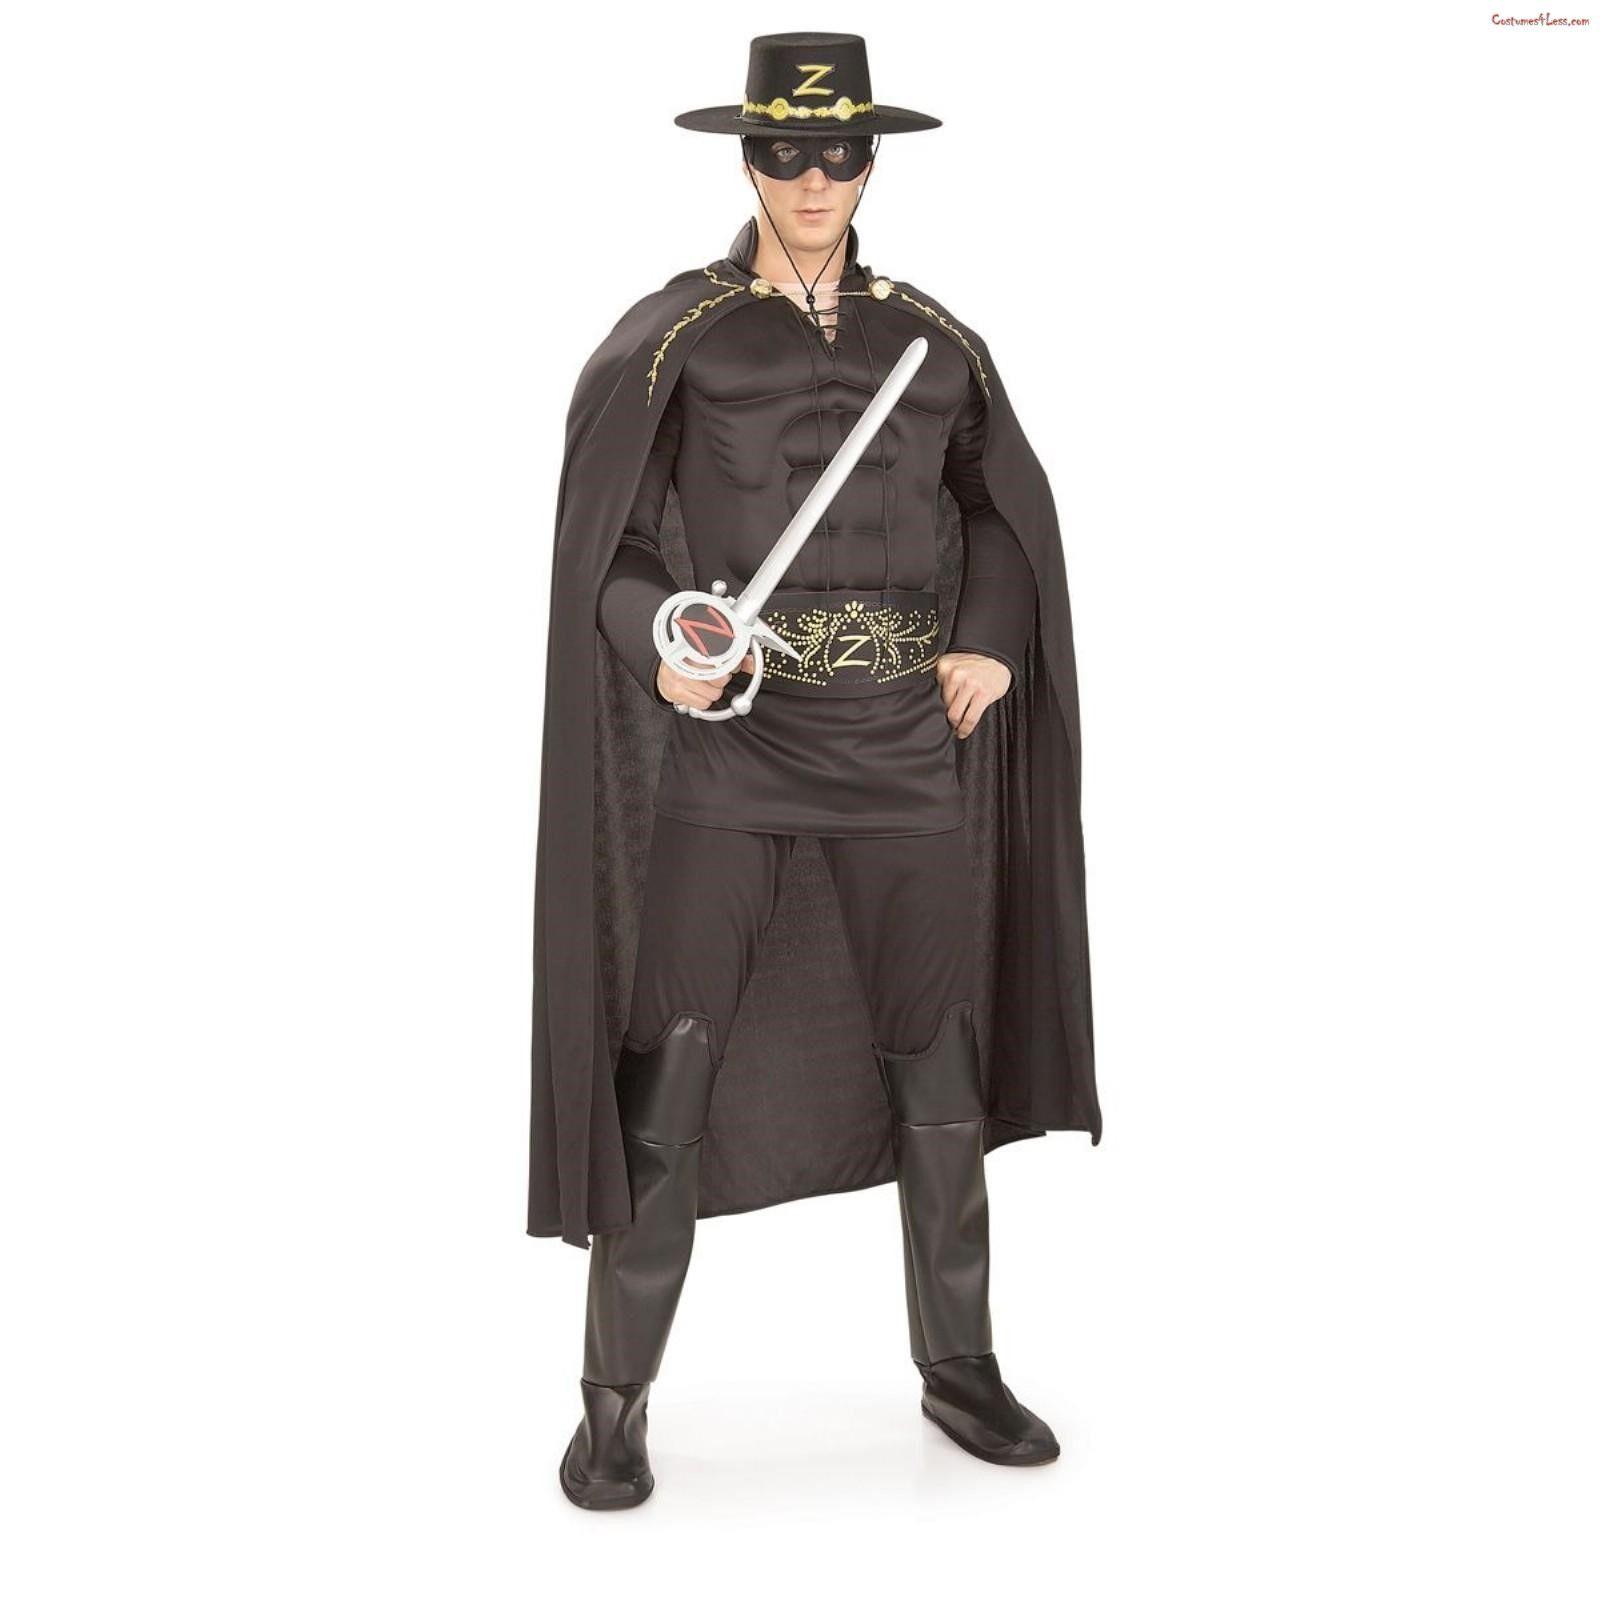 ZORRO-Deluxe Costume Adulto